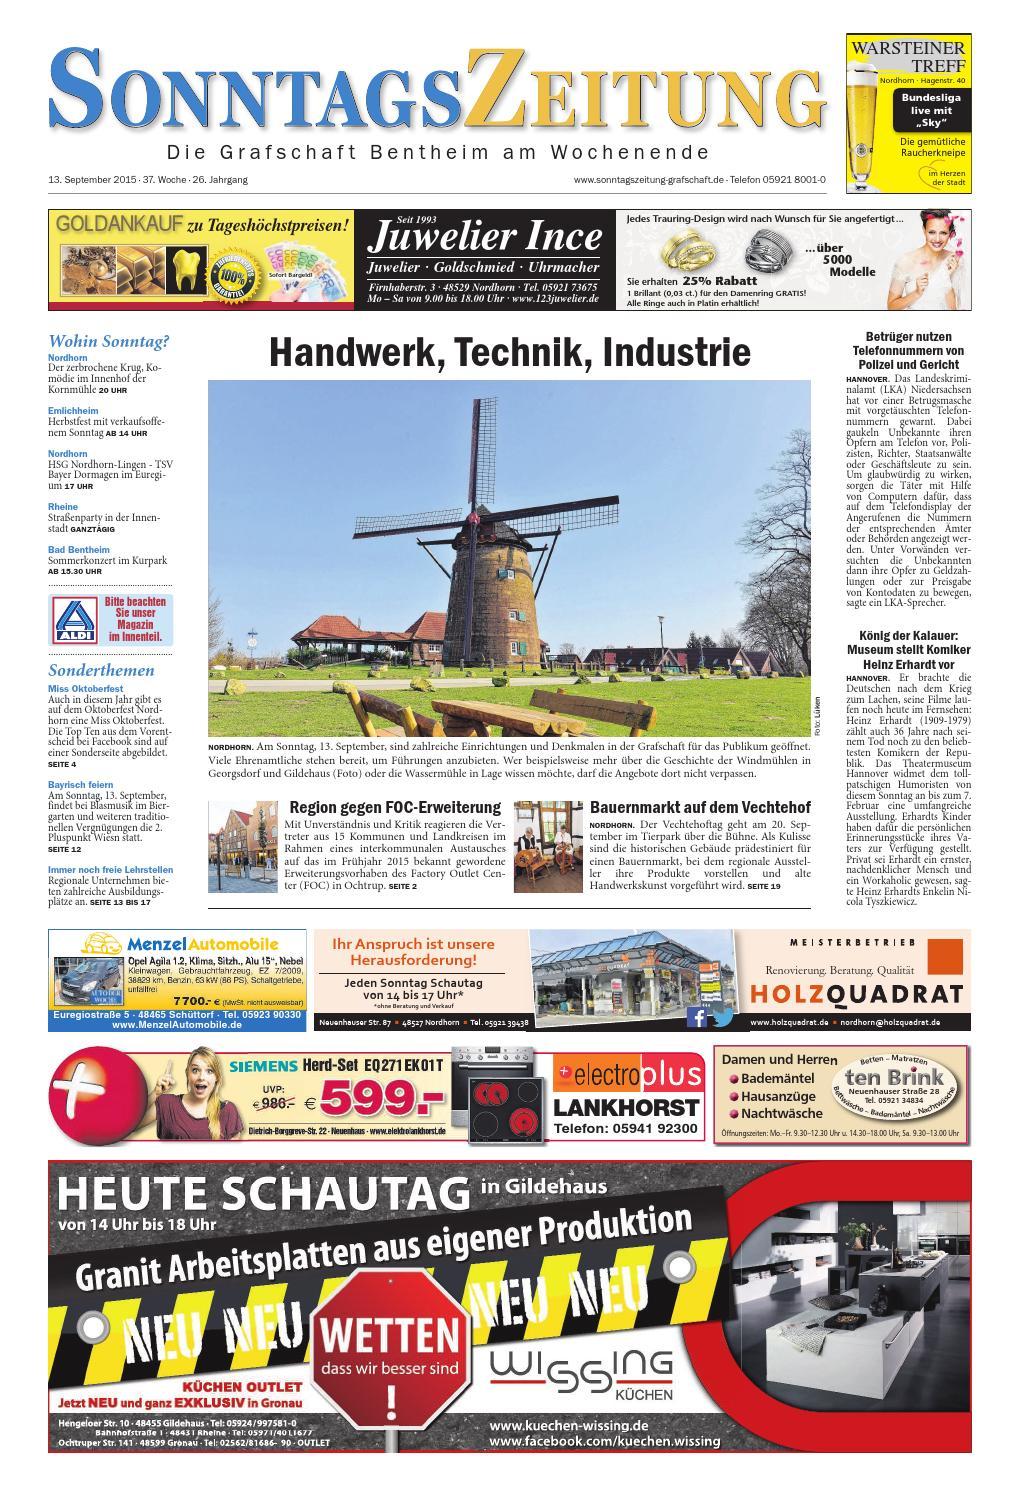 SonntagsZeitung_13.09.2015 by SonntagsZeitung - issuu